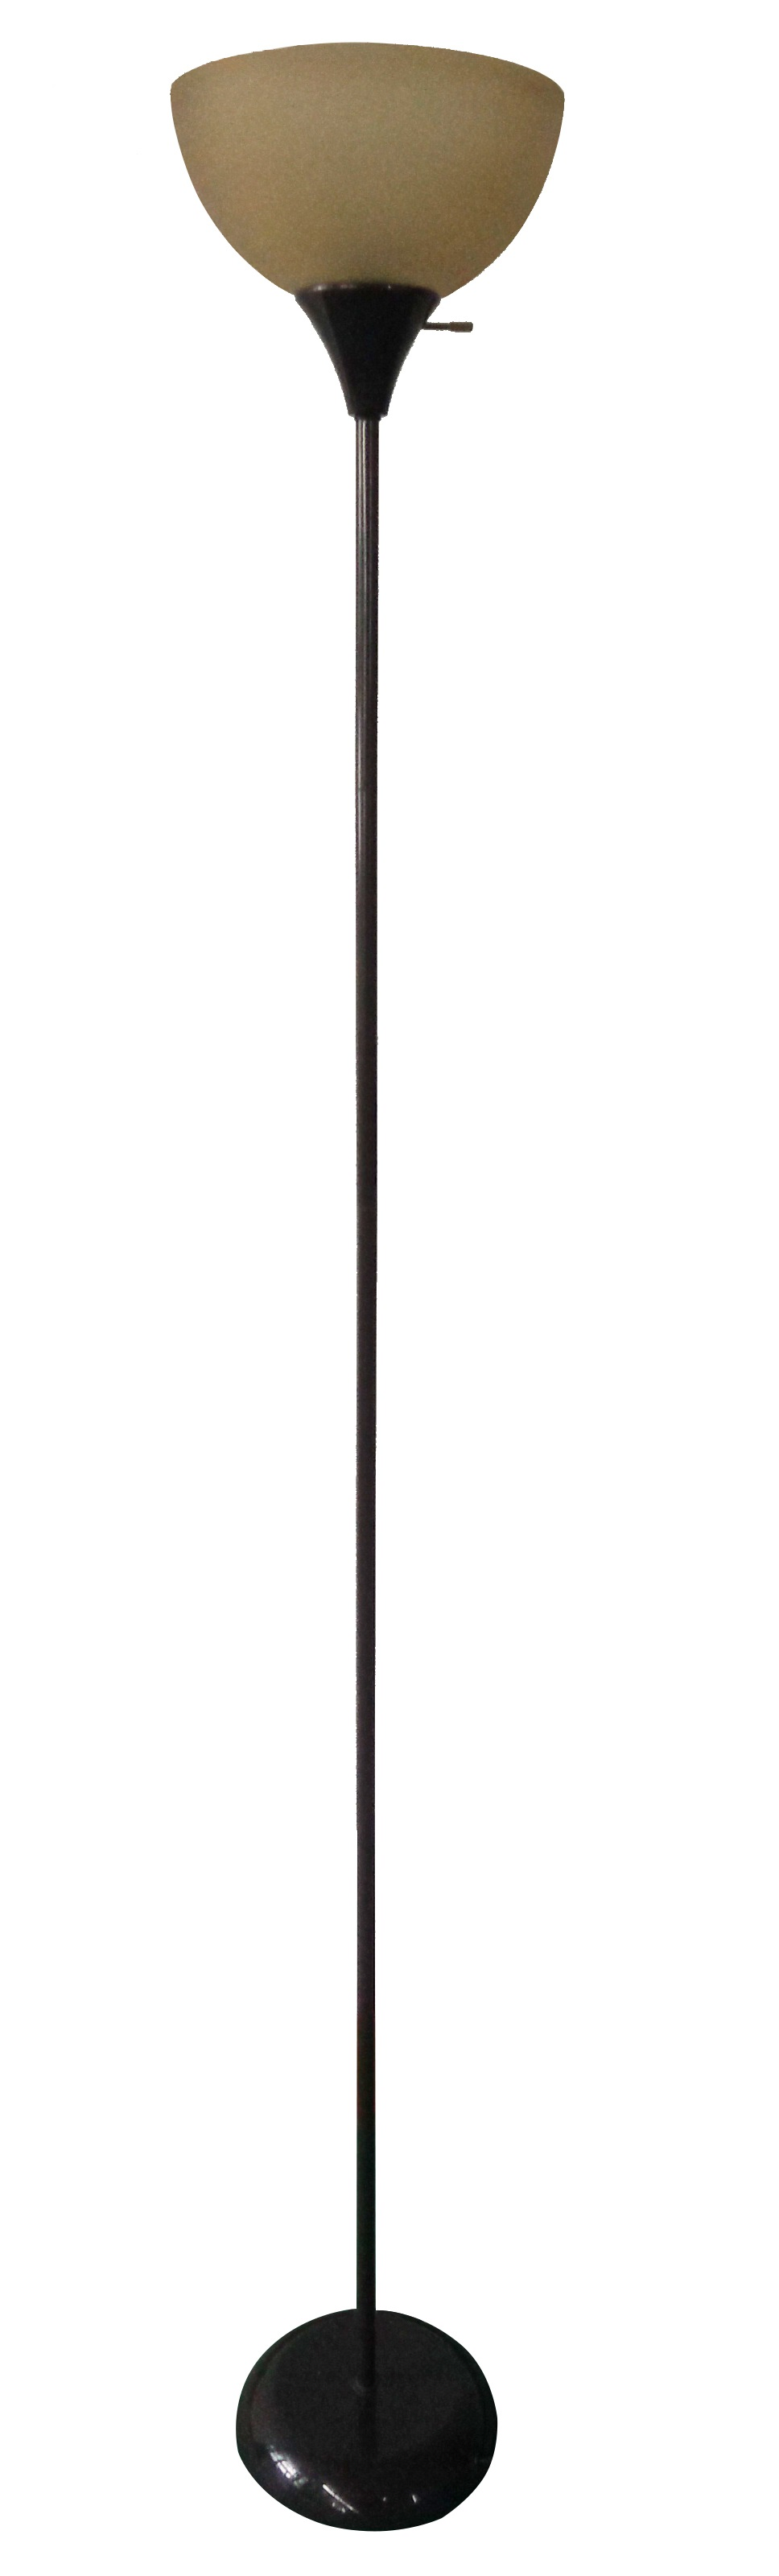 Mainstays floor lamp brown finish walmart aloadofball Image collections